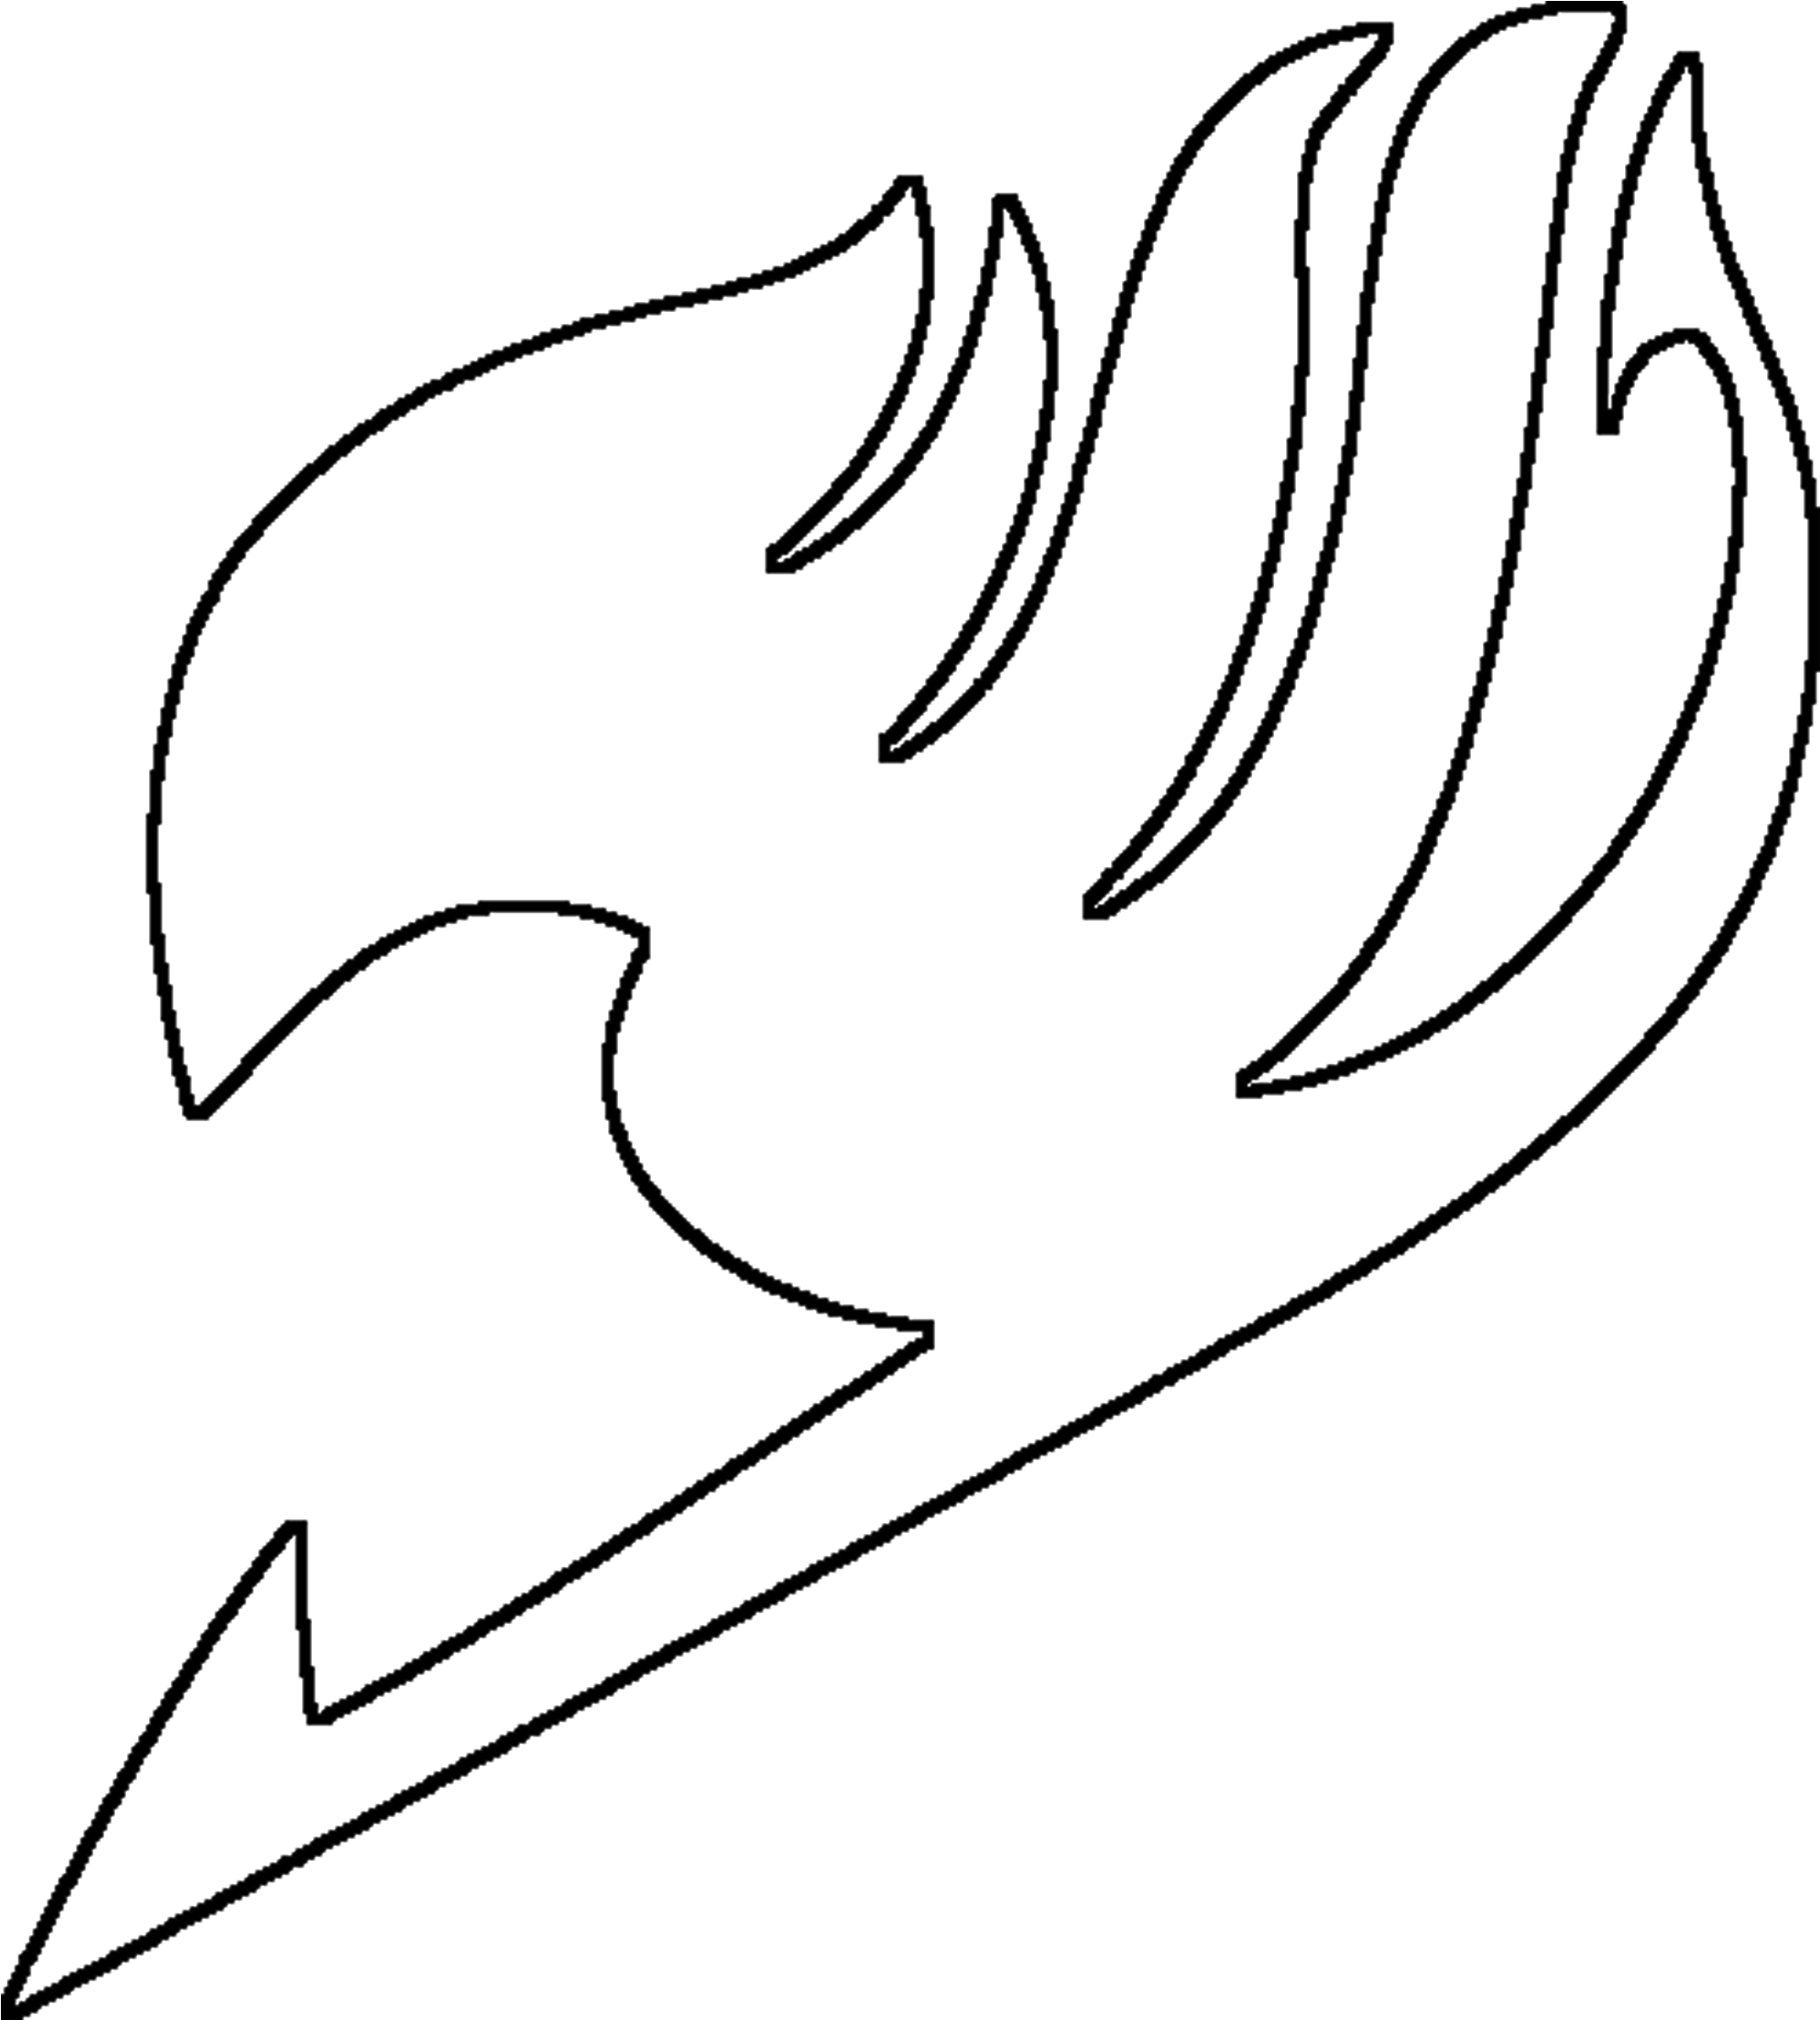 Значок фейри тейл картинки